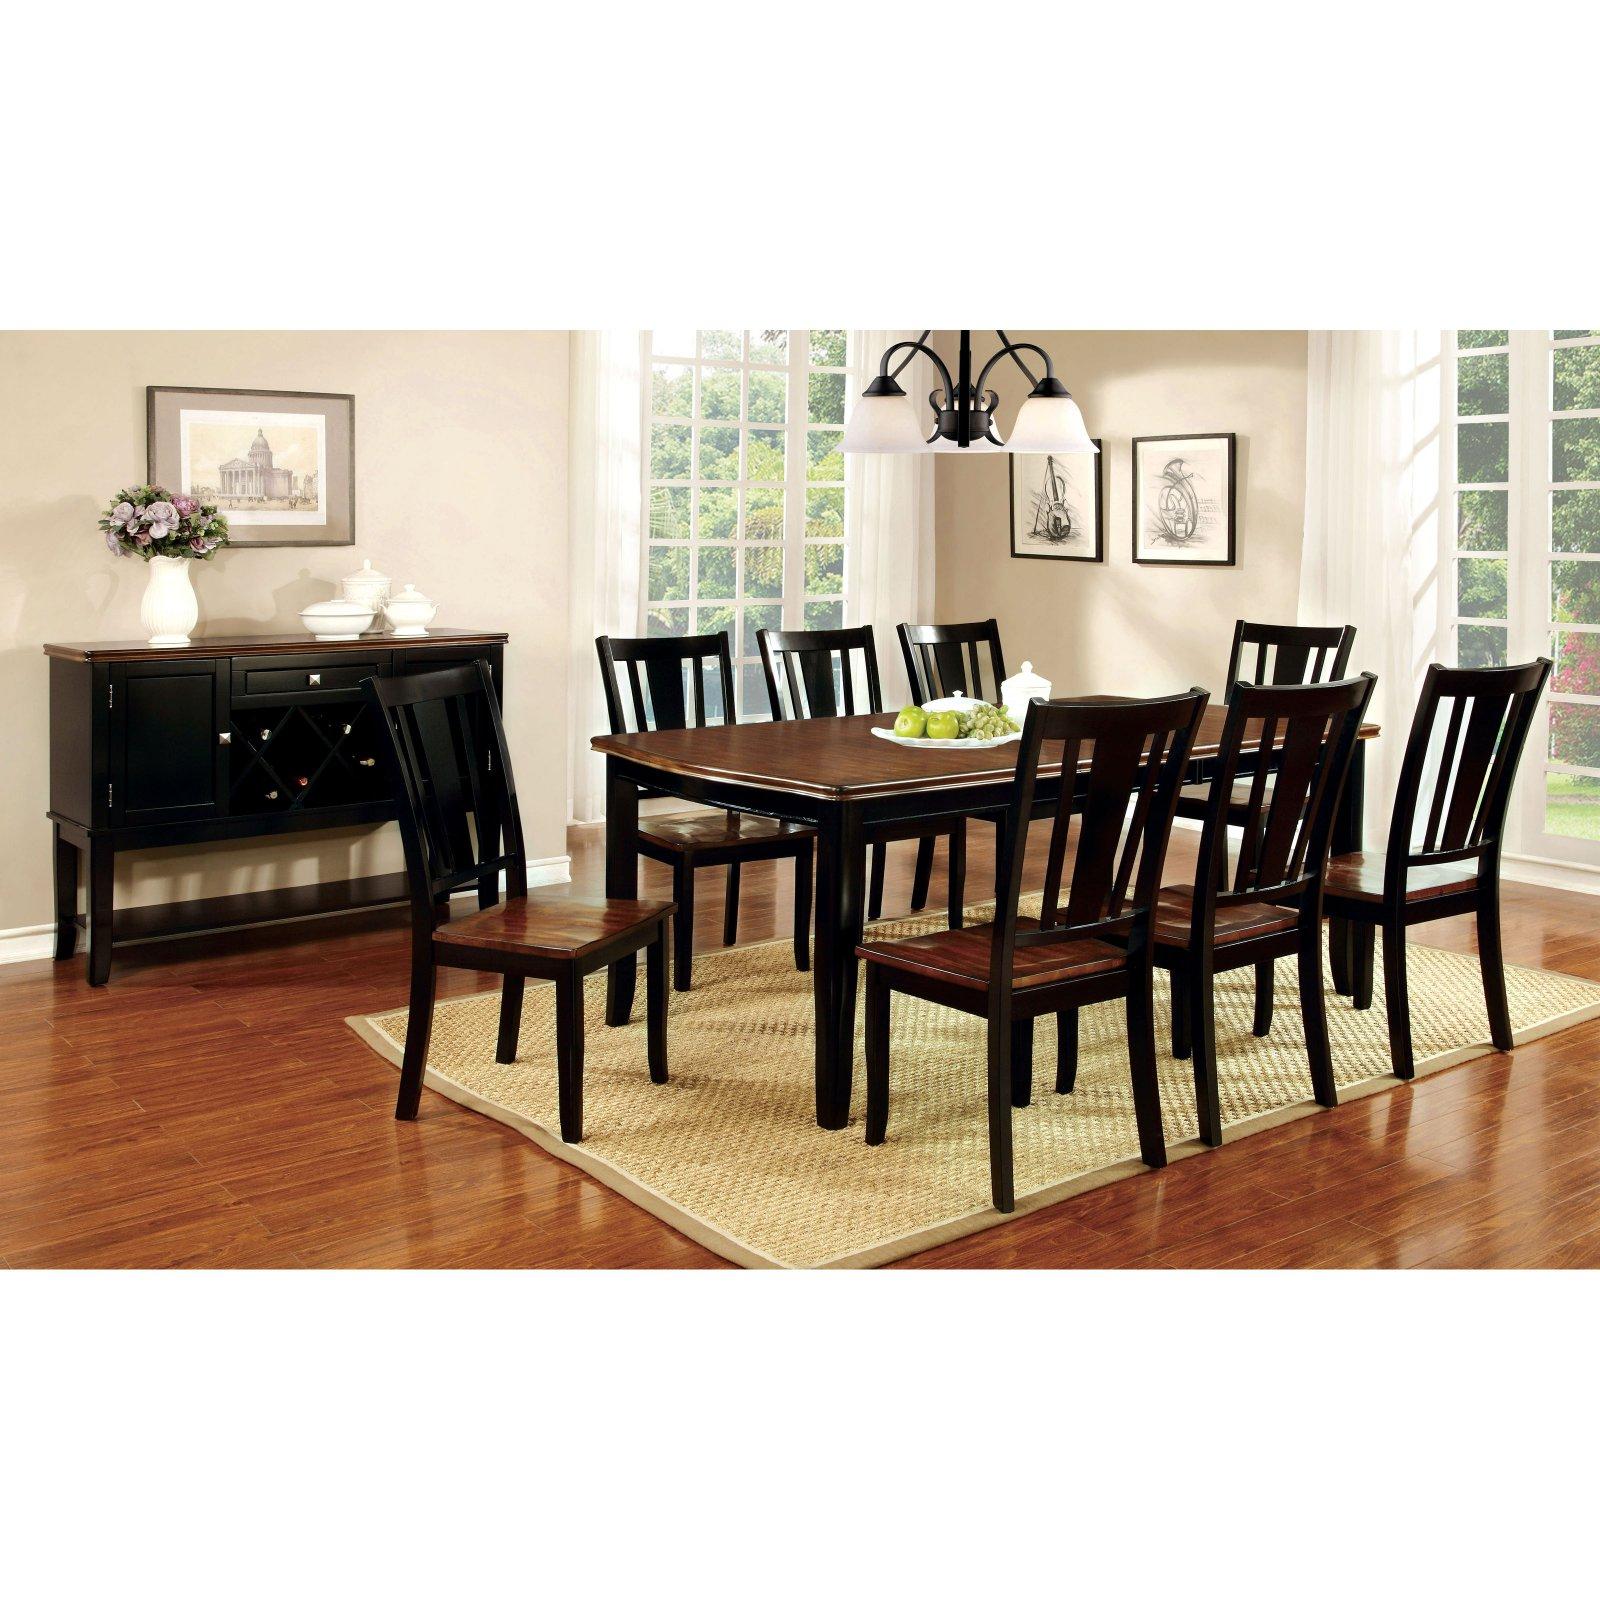 Furniture of America Lohman Dual-Tone Rectangular Dining Table